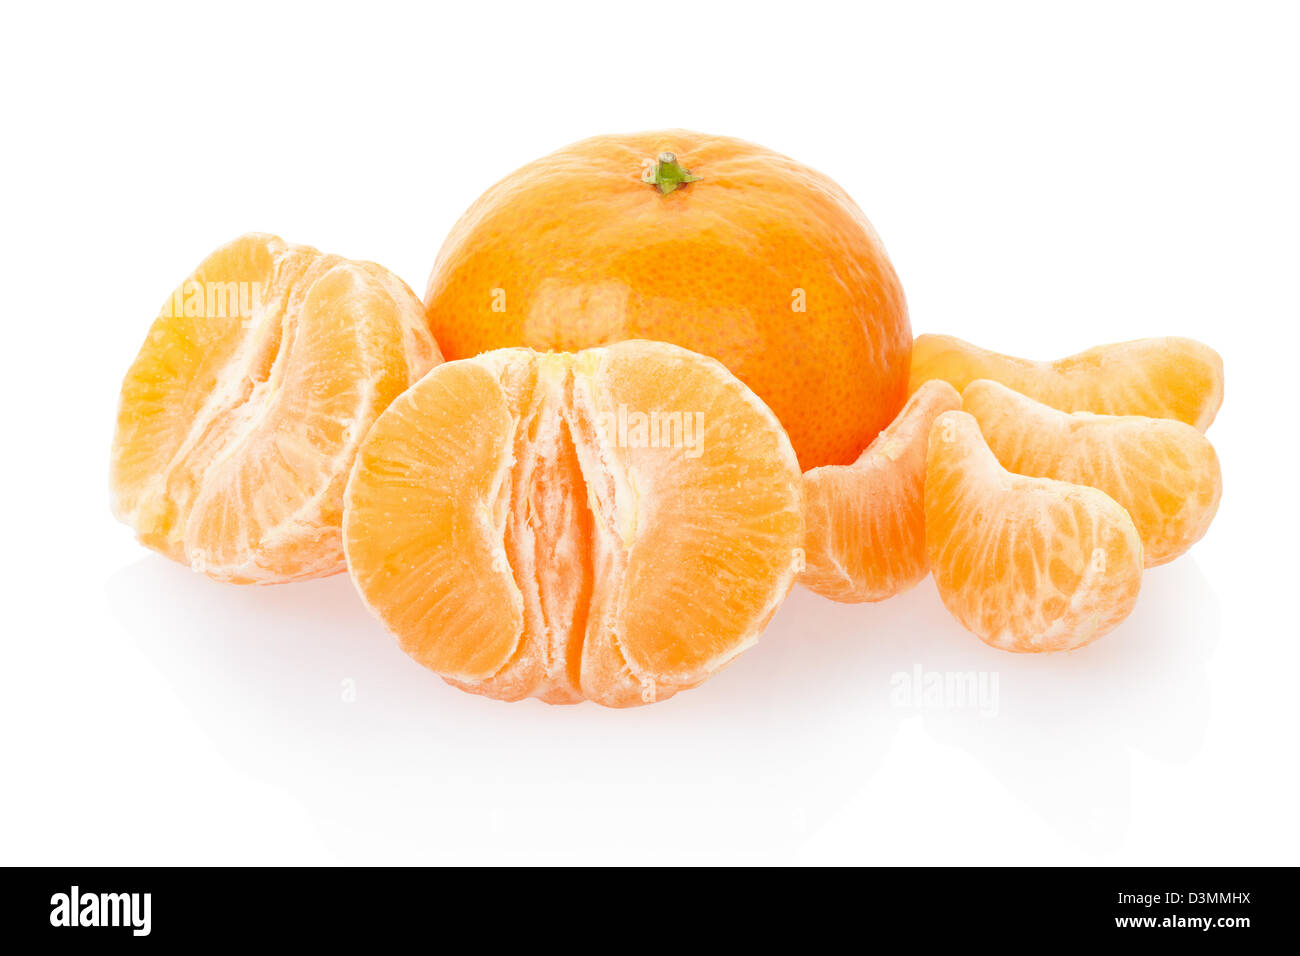 Tangerine, citrus fruit - Stock Image